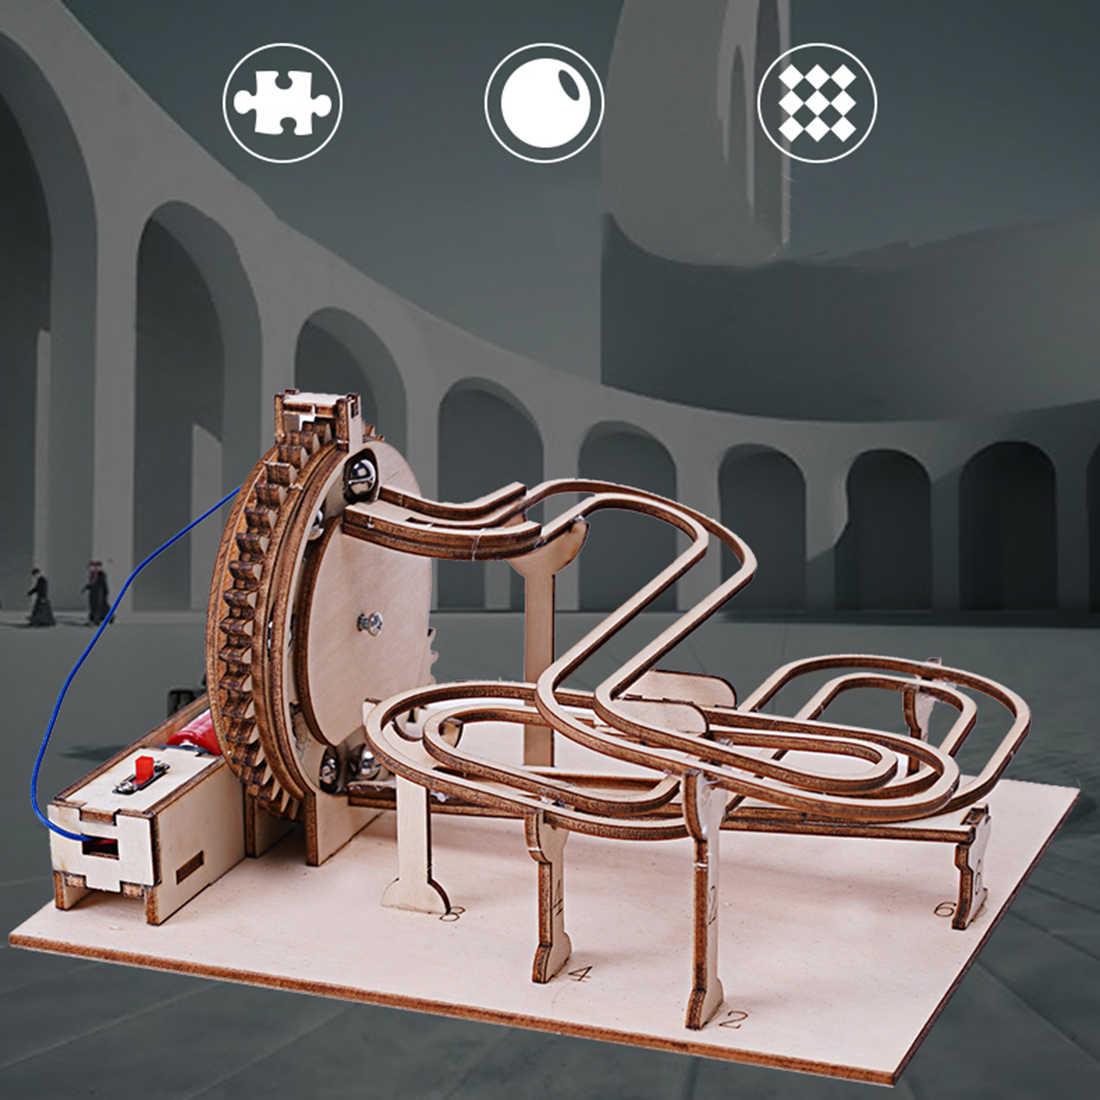 Marble Run Gear-Conjunto de transmisión de marmol, modelo de construcción, rompecabezas 3D de madera, modelo de juguete, regalos